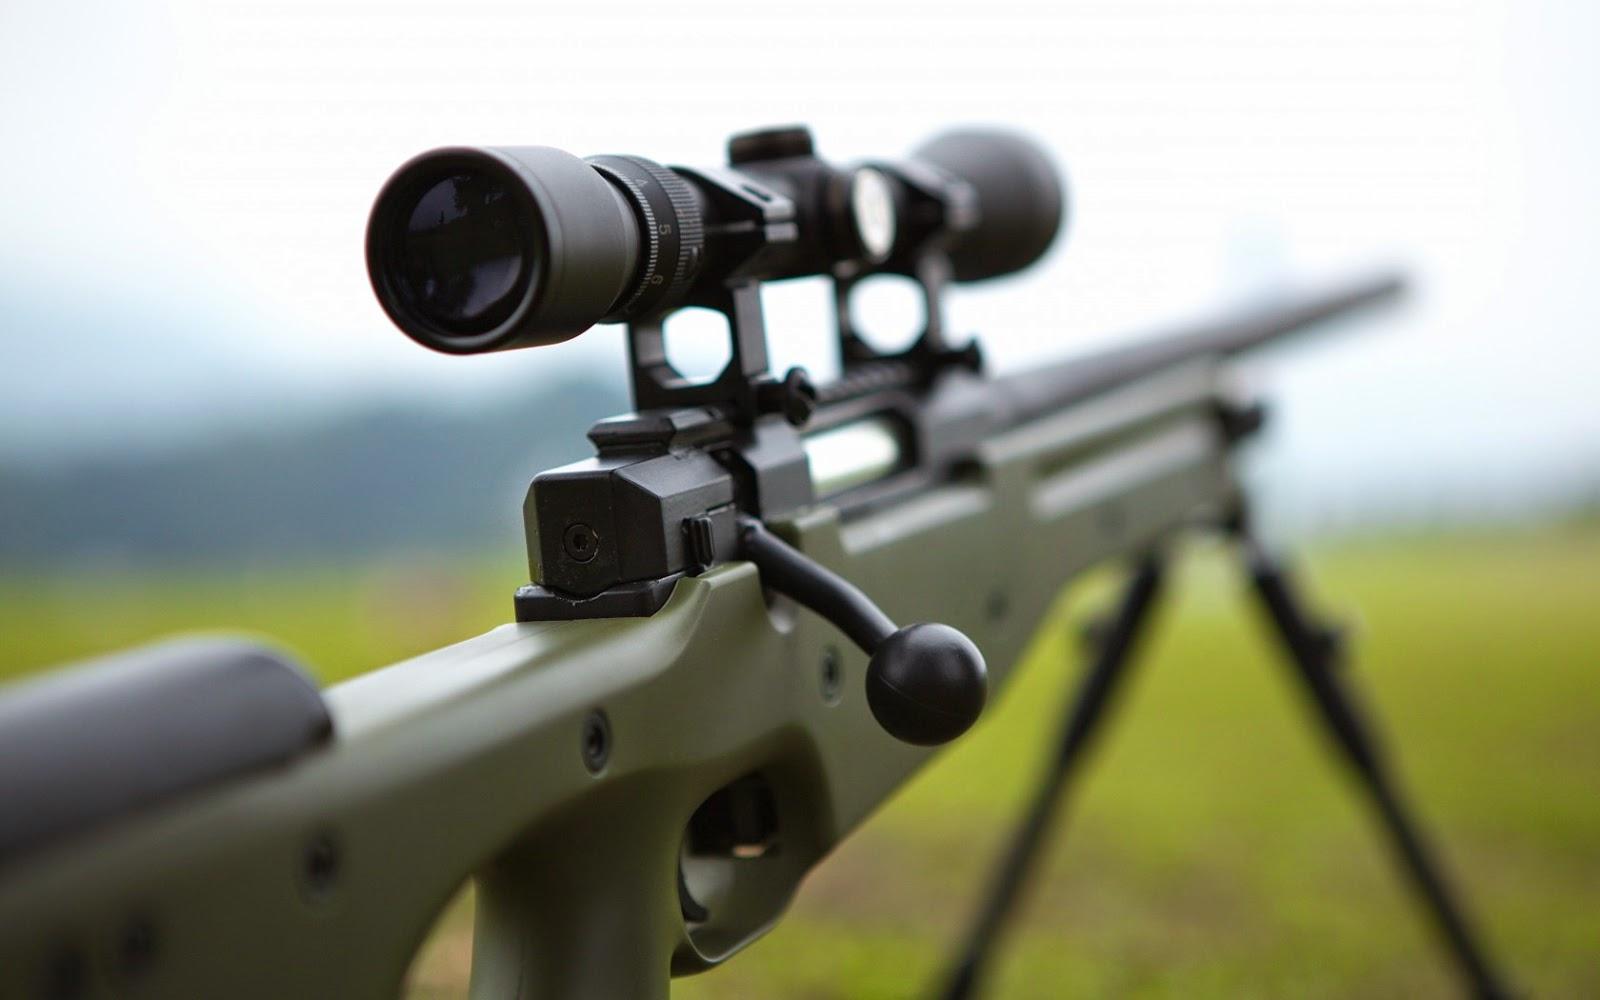 AWP HD Sniper Rifle Wallpaper British Made I Think 1600x1000